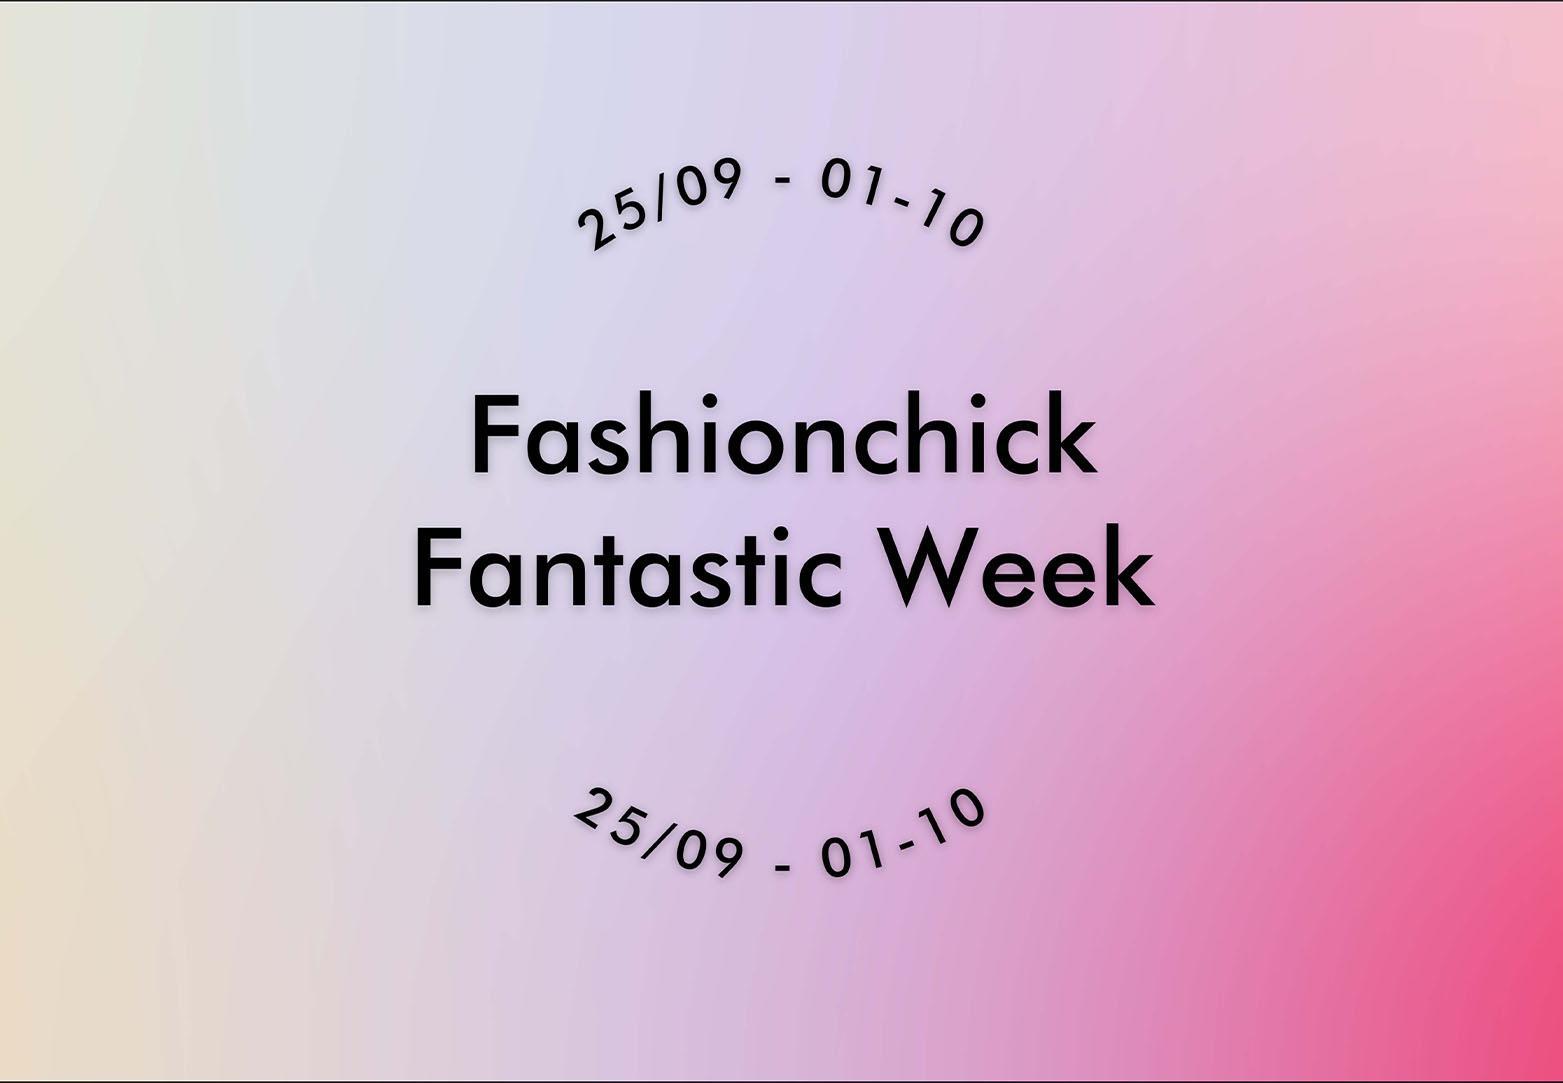 Fashionchick Fantastic Week - Deze merken doen mee